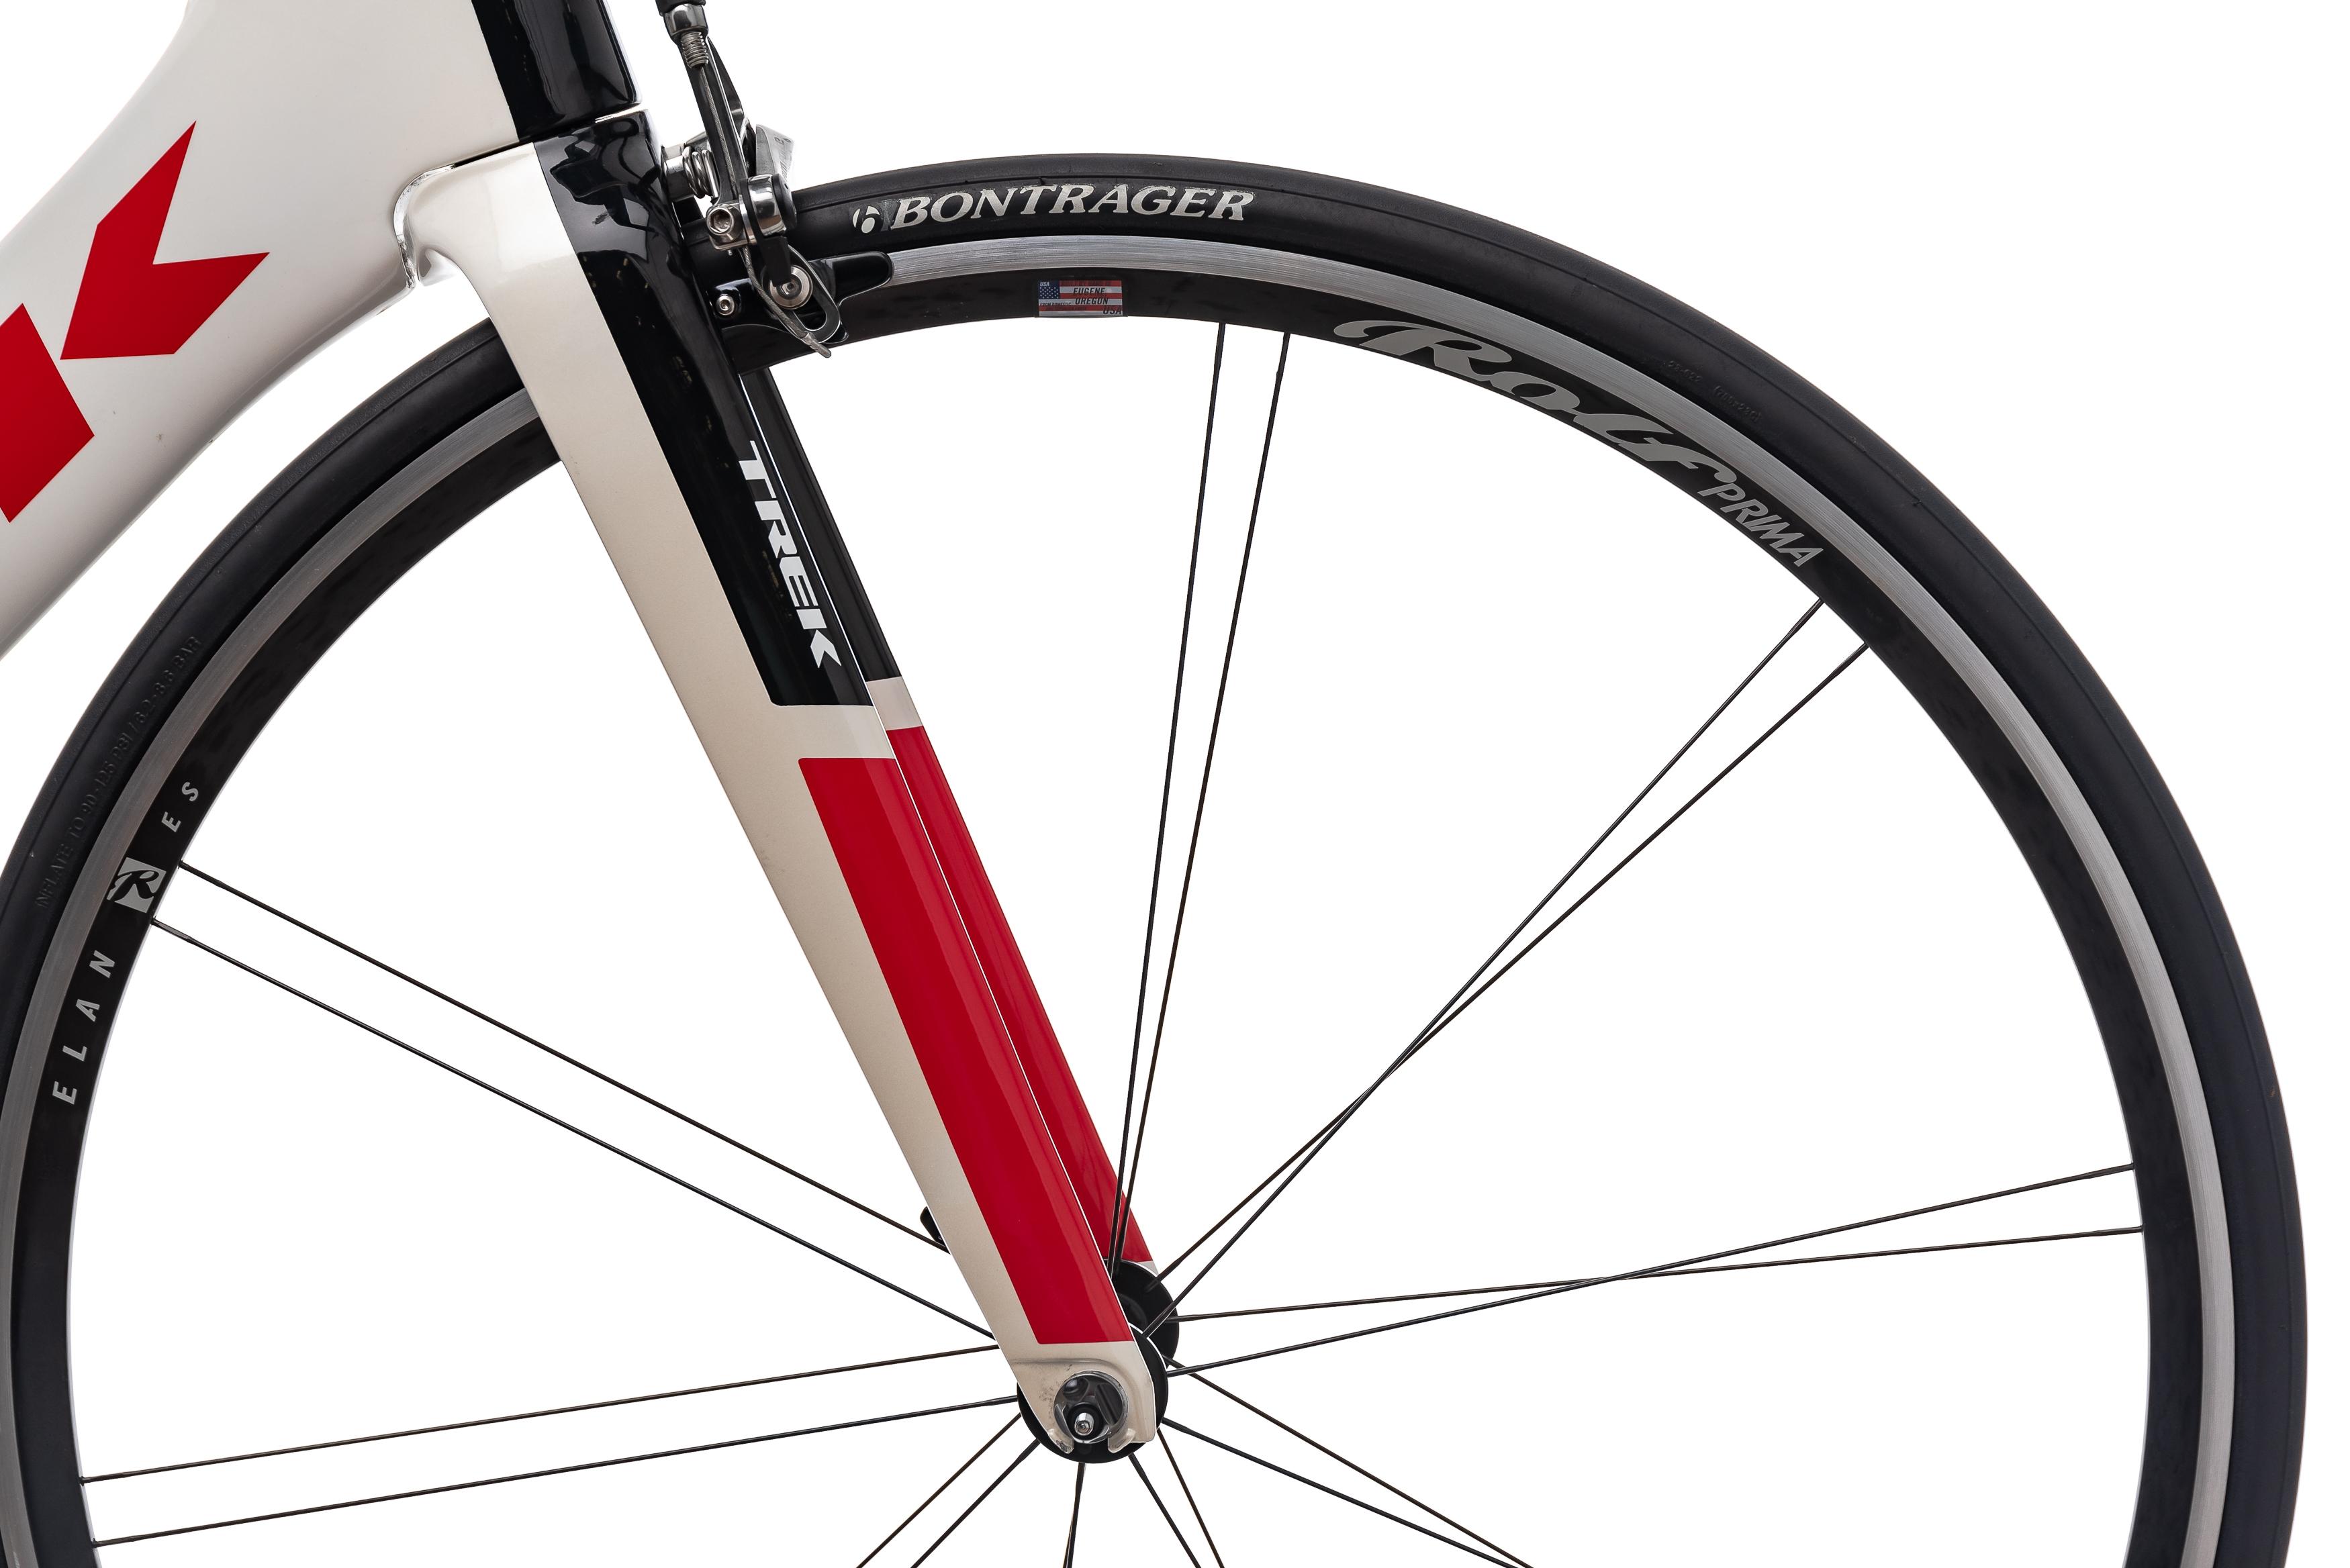 2013-Trek-Speed-Concept-7-Series-Time-Trial-Bike-XL-Carbon-SRAM-Force-Rolf miniature 5